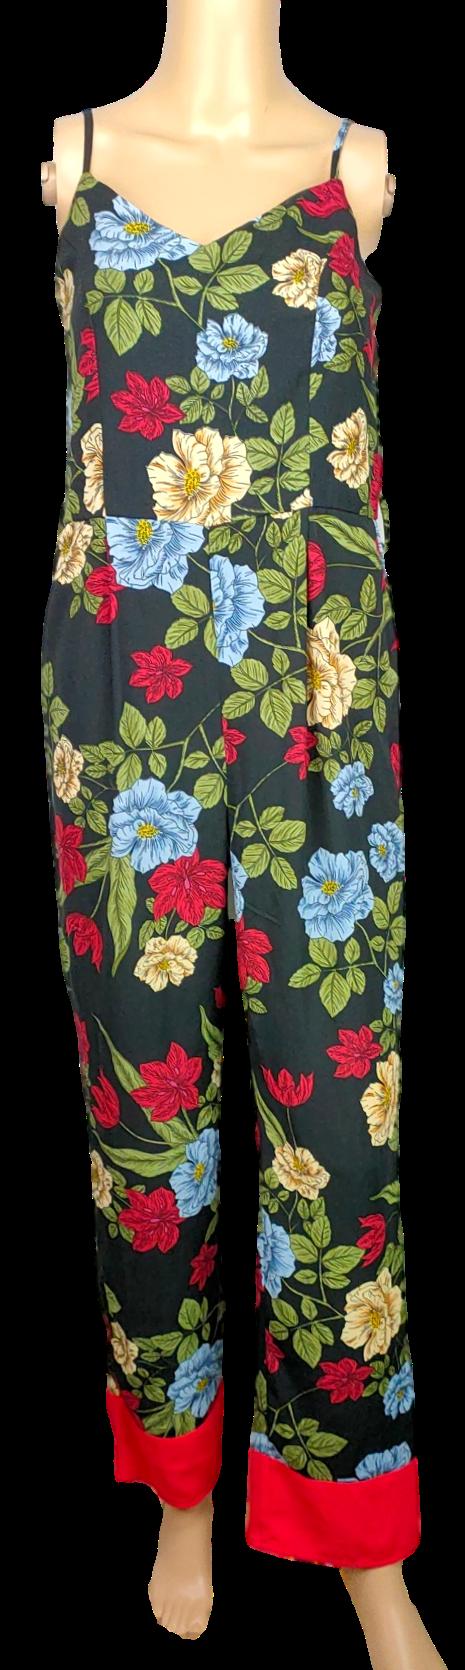 Combi-Pantalon IN Vogue -Taille M